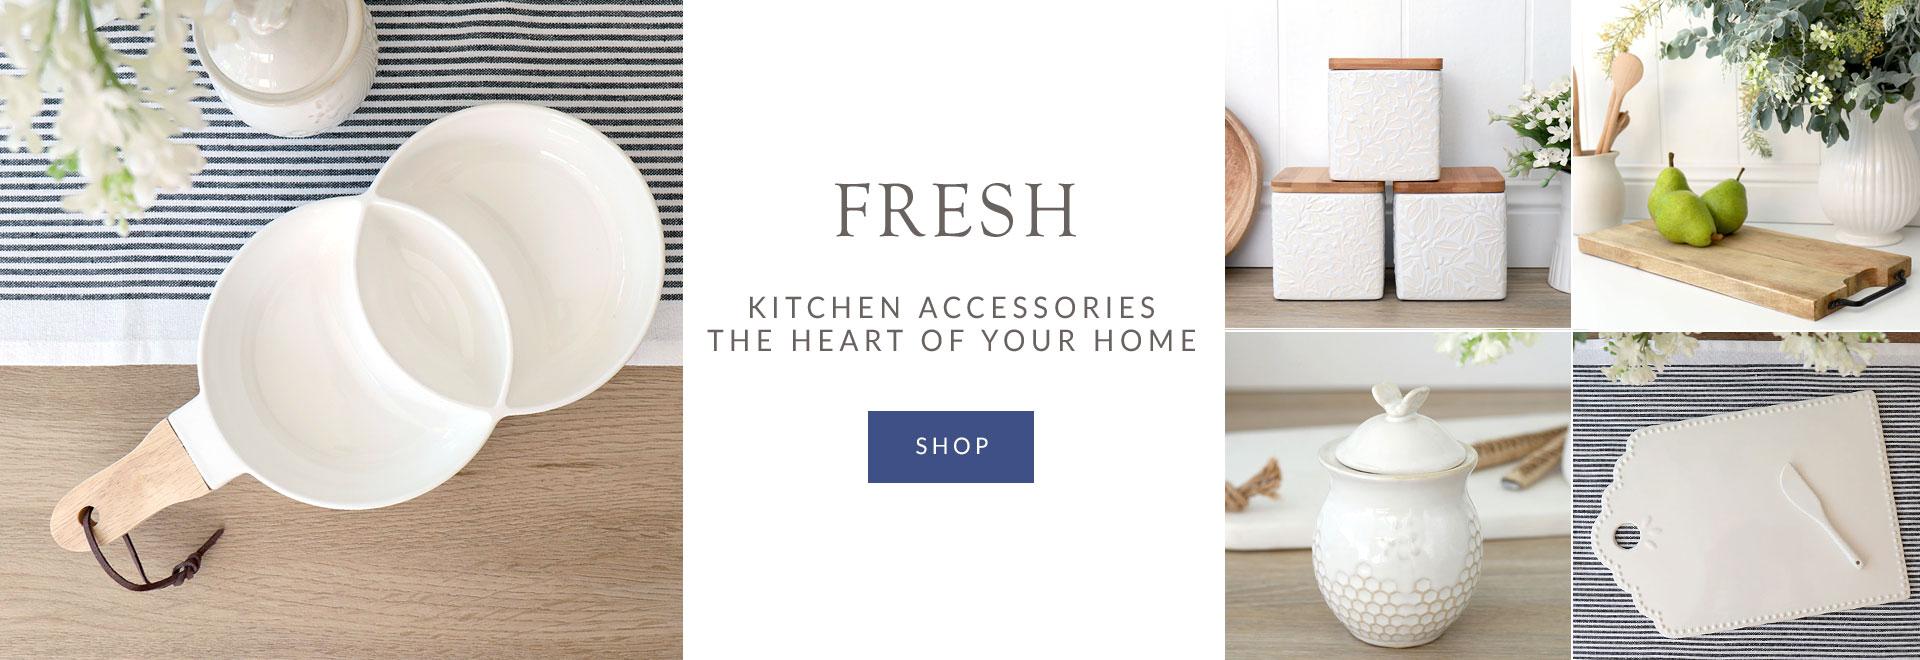 Homewares Sydney: Home Accessories & Decor Online